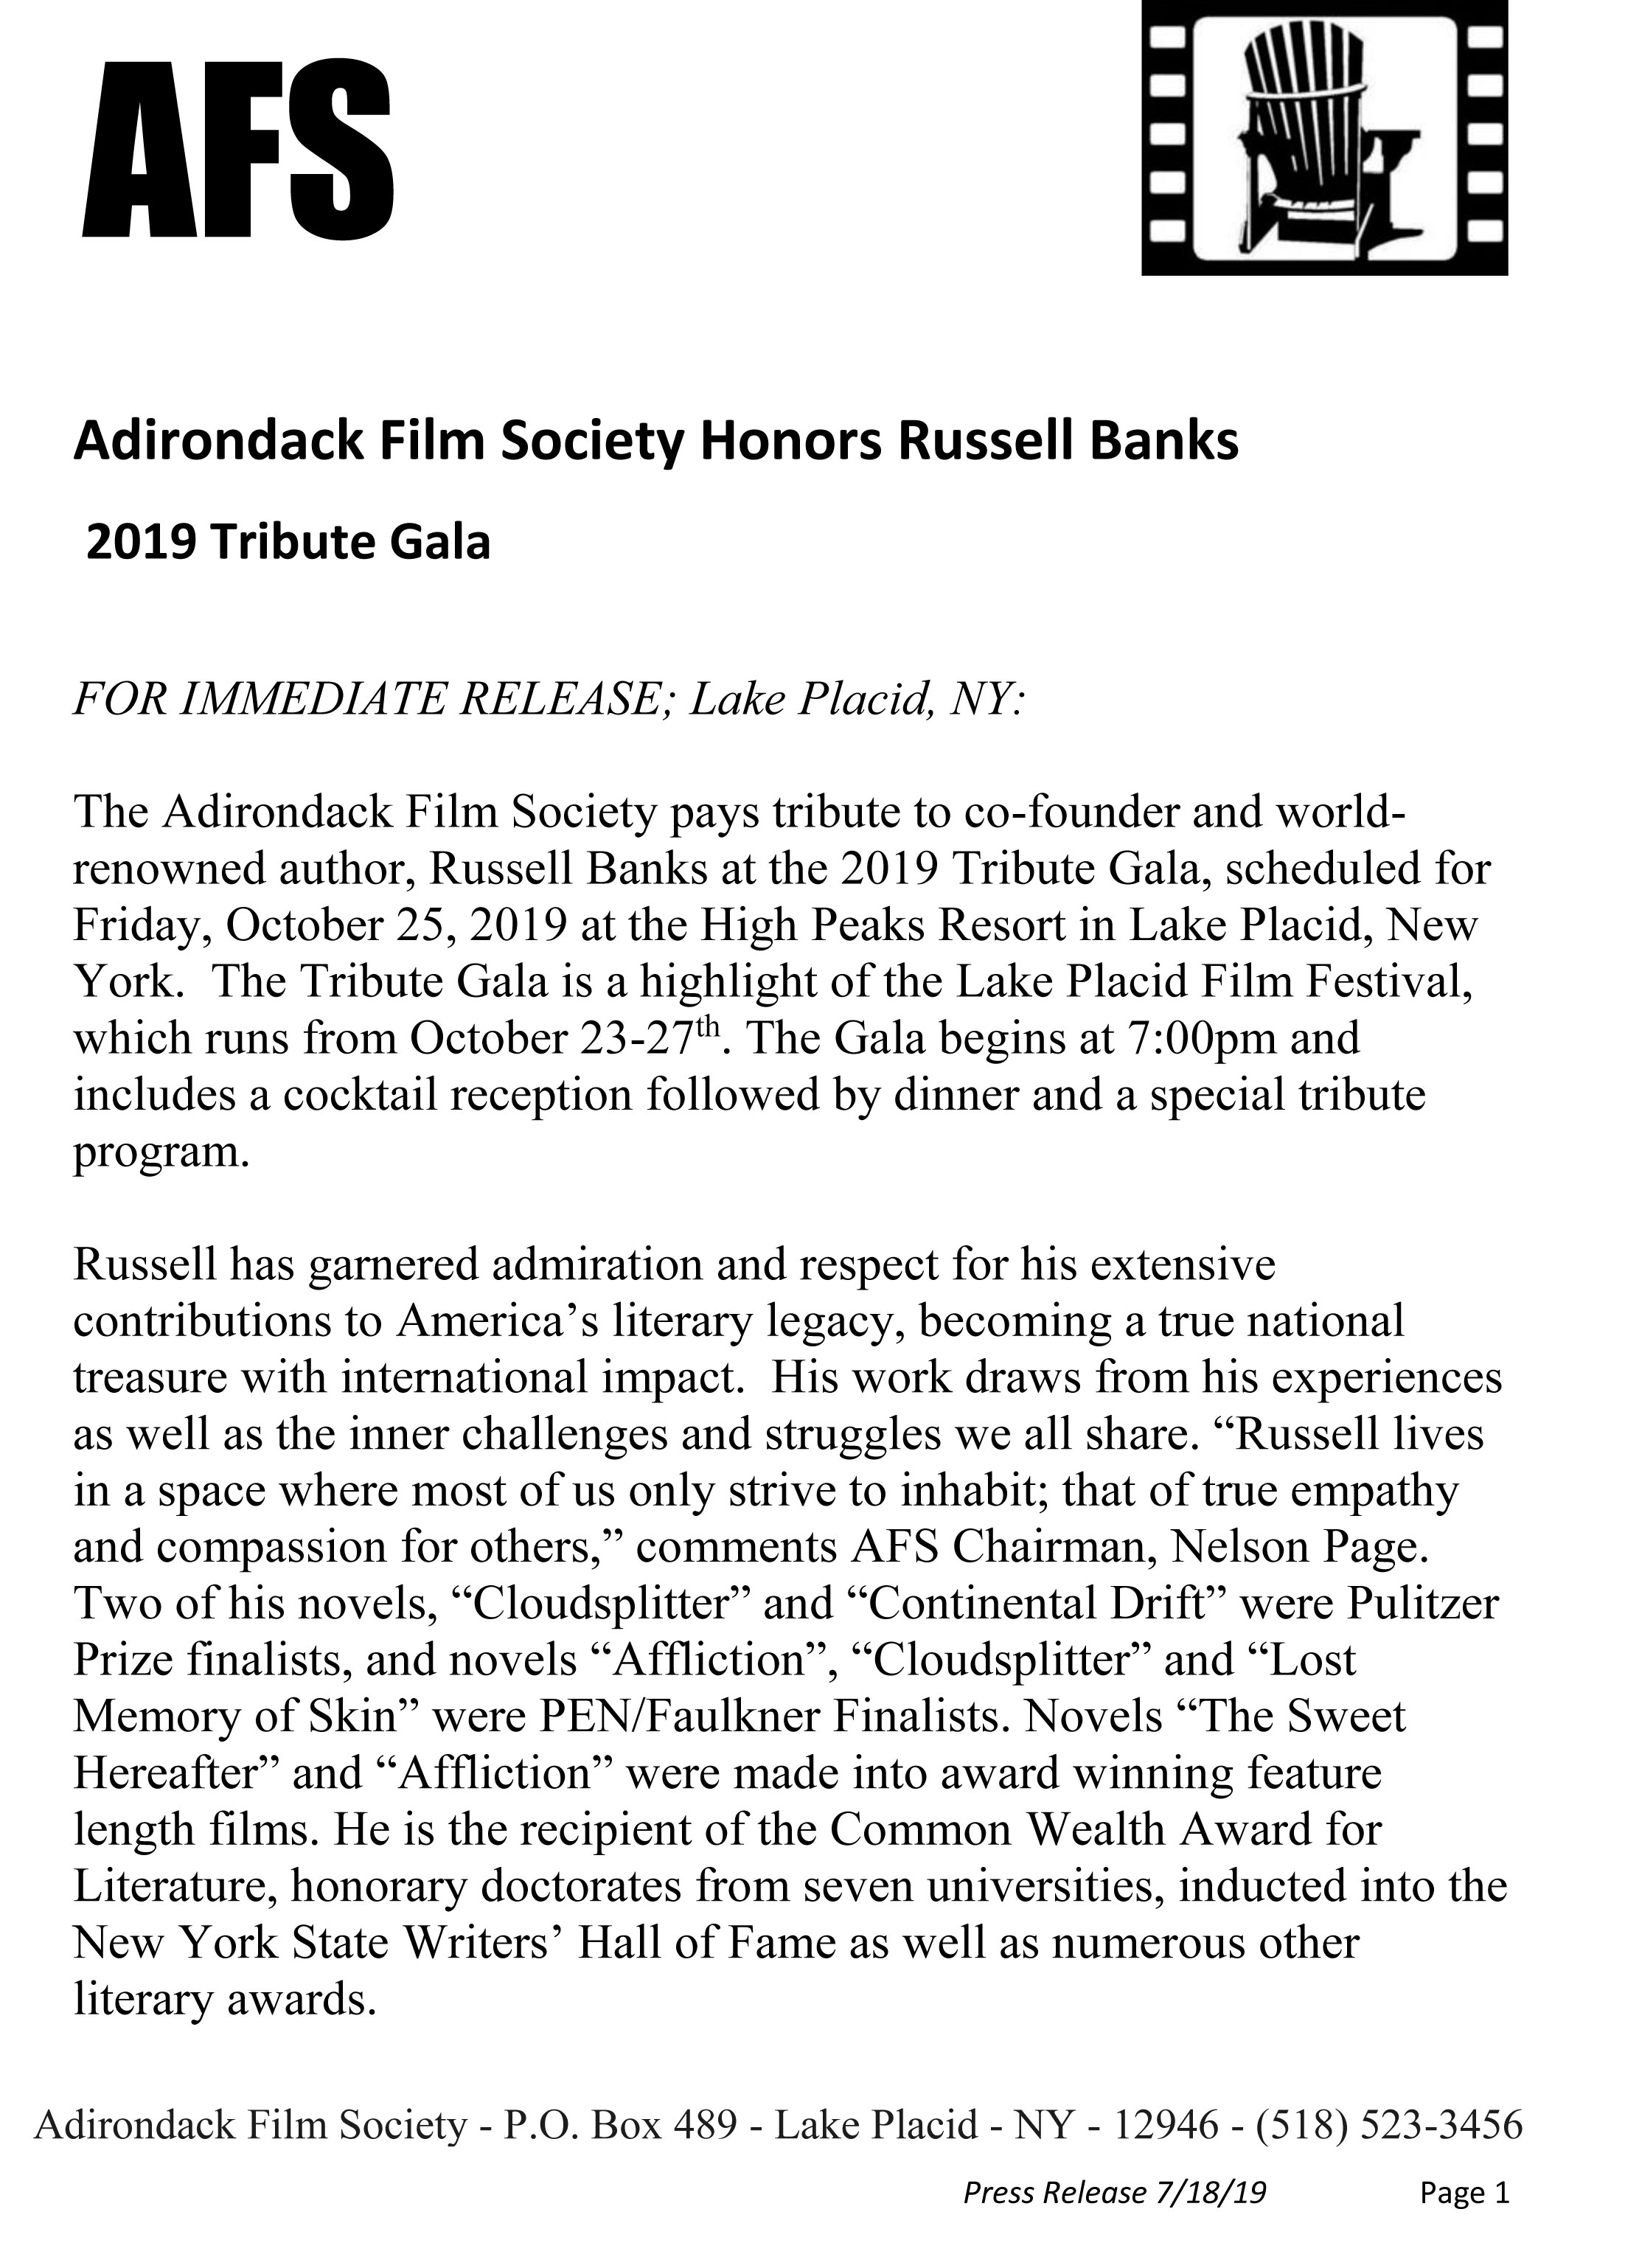 Adirondack-Film-Society-Pre.jpg